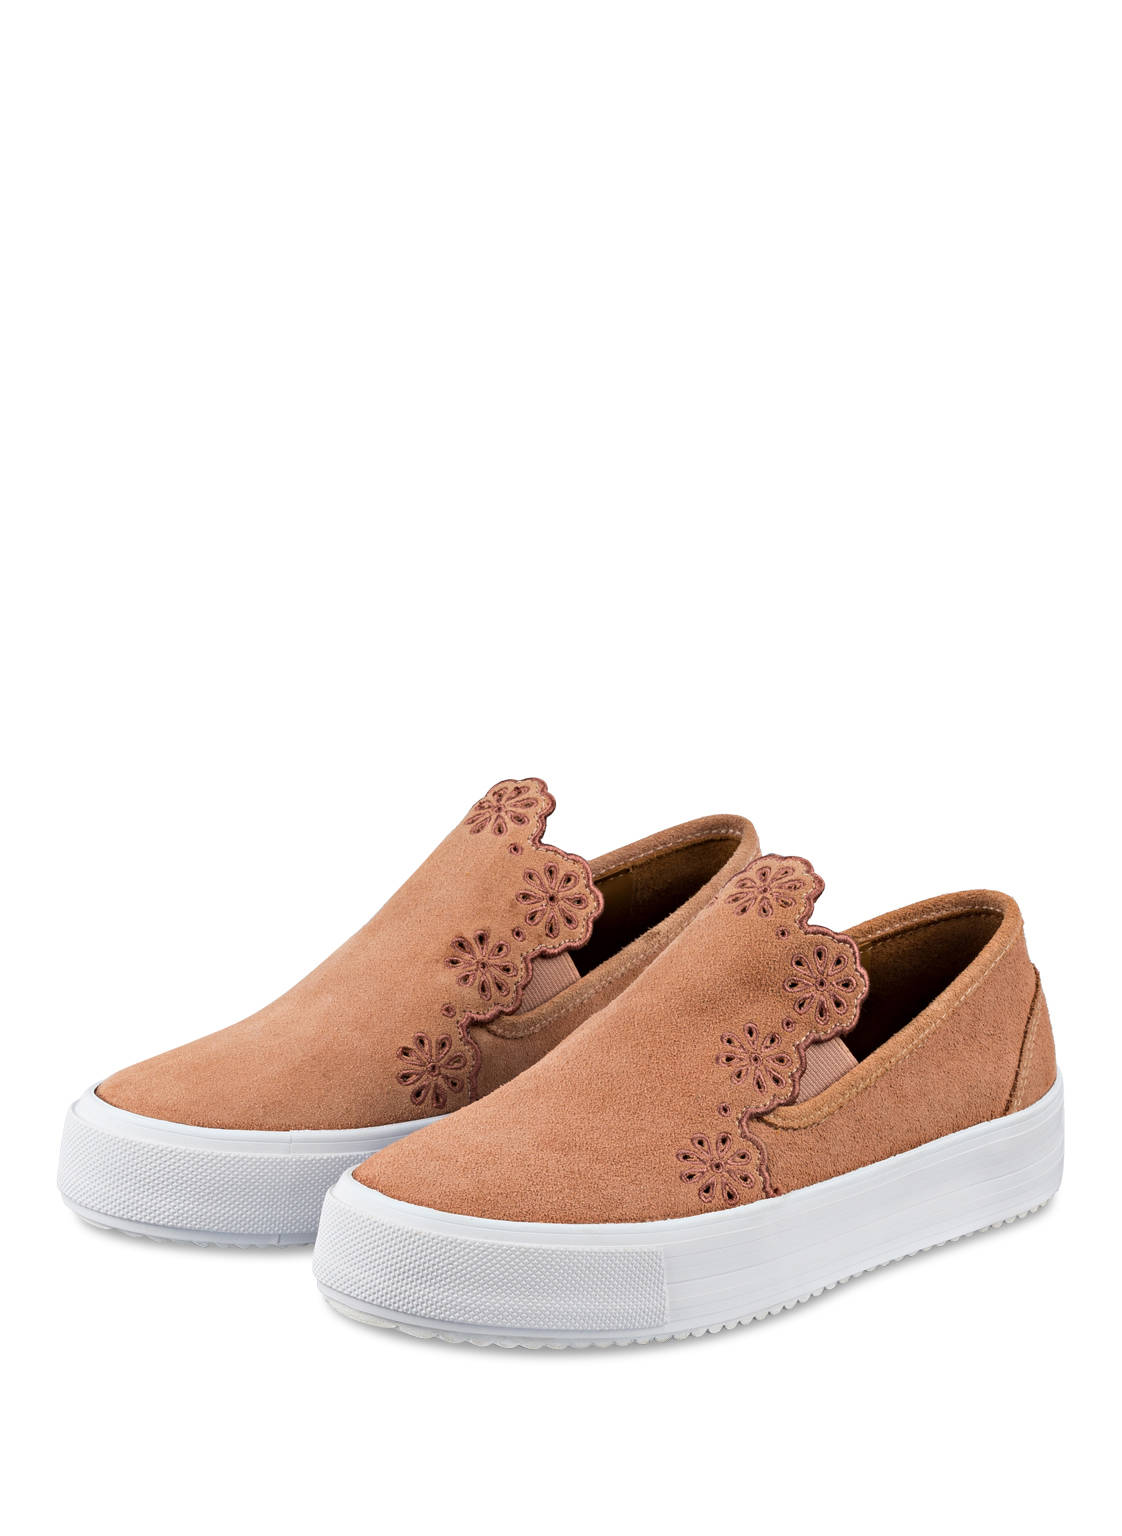 SEE BY CHLOÉ Slip-on-Sneaker VERA